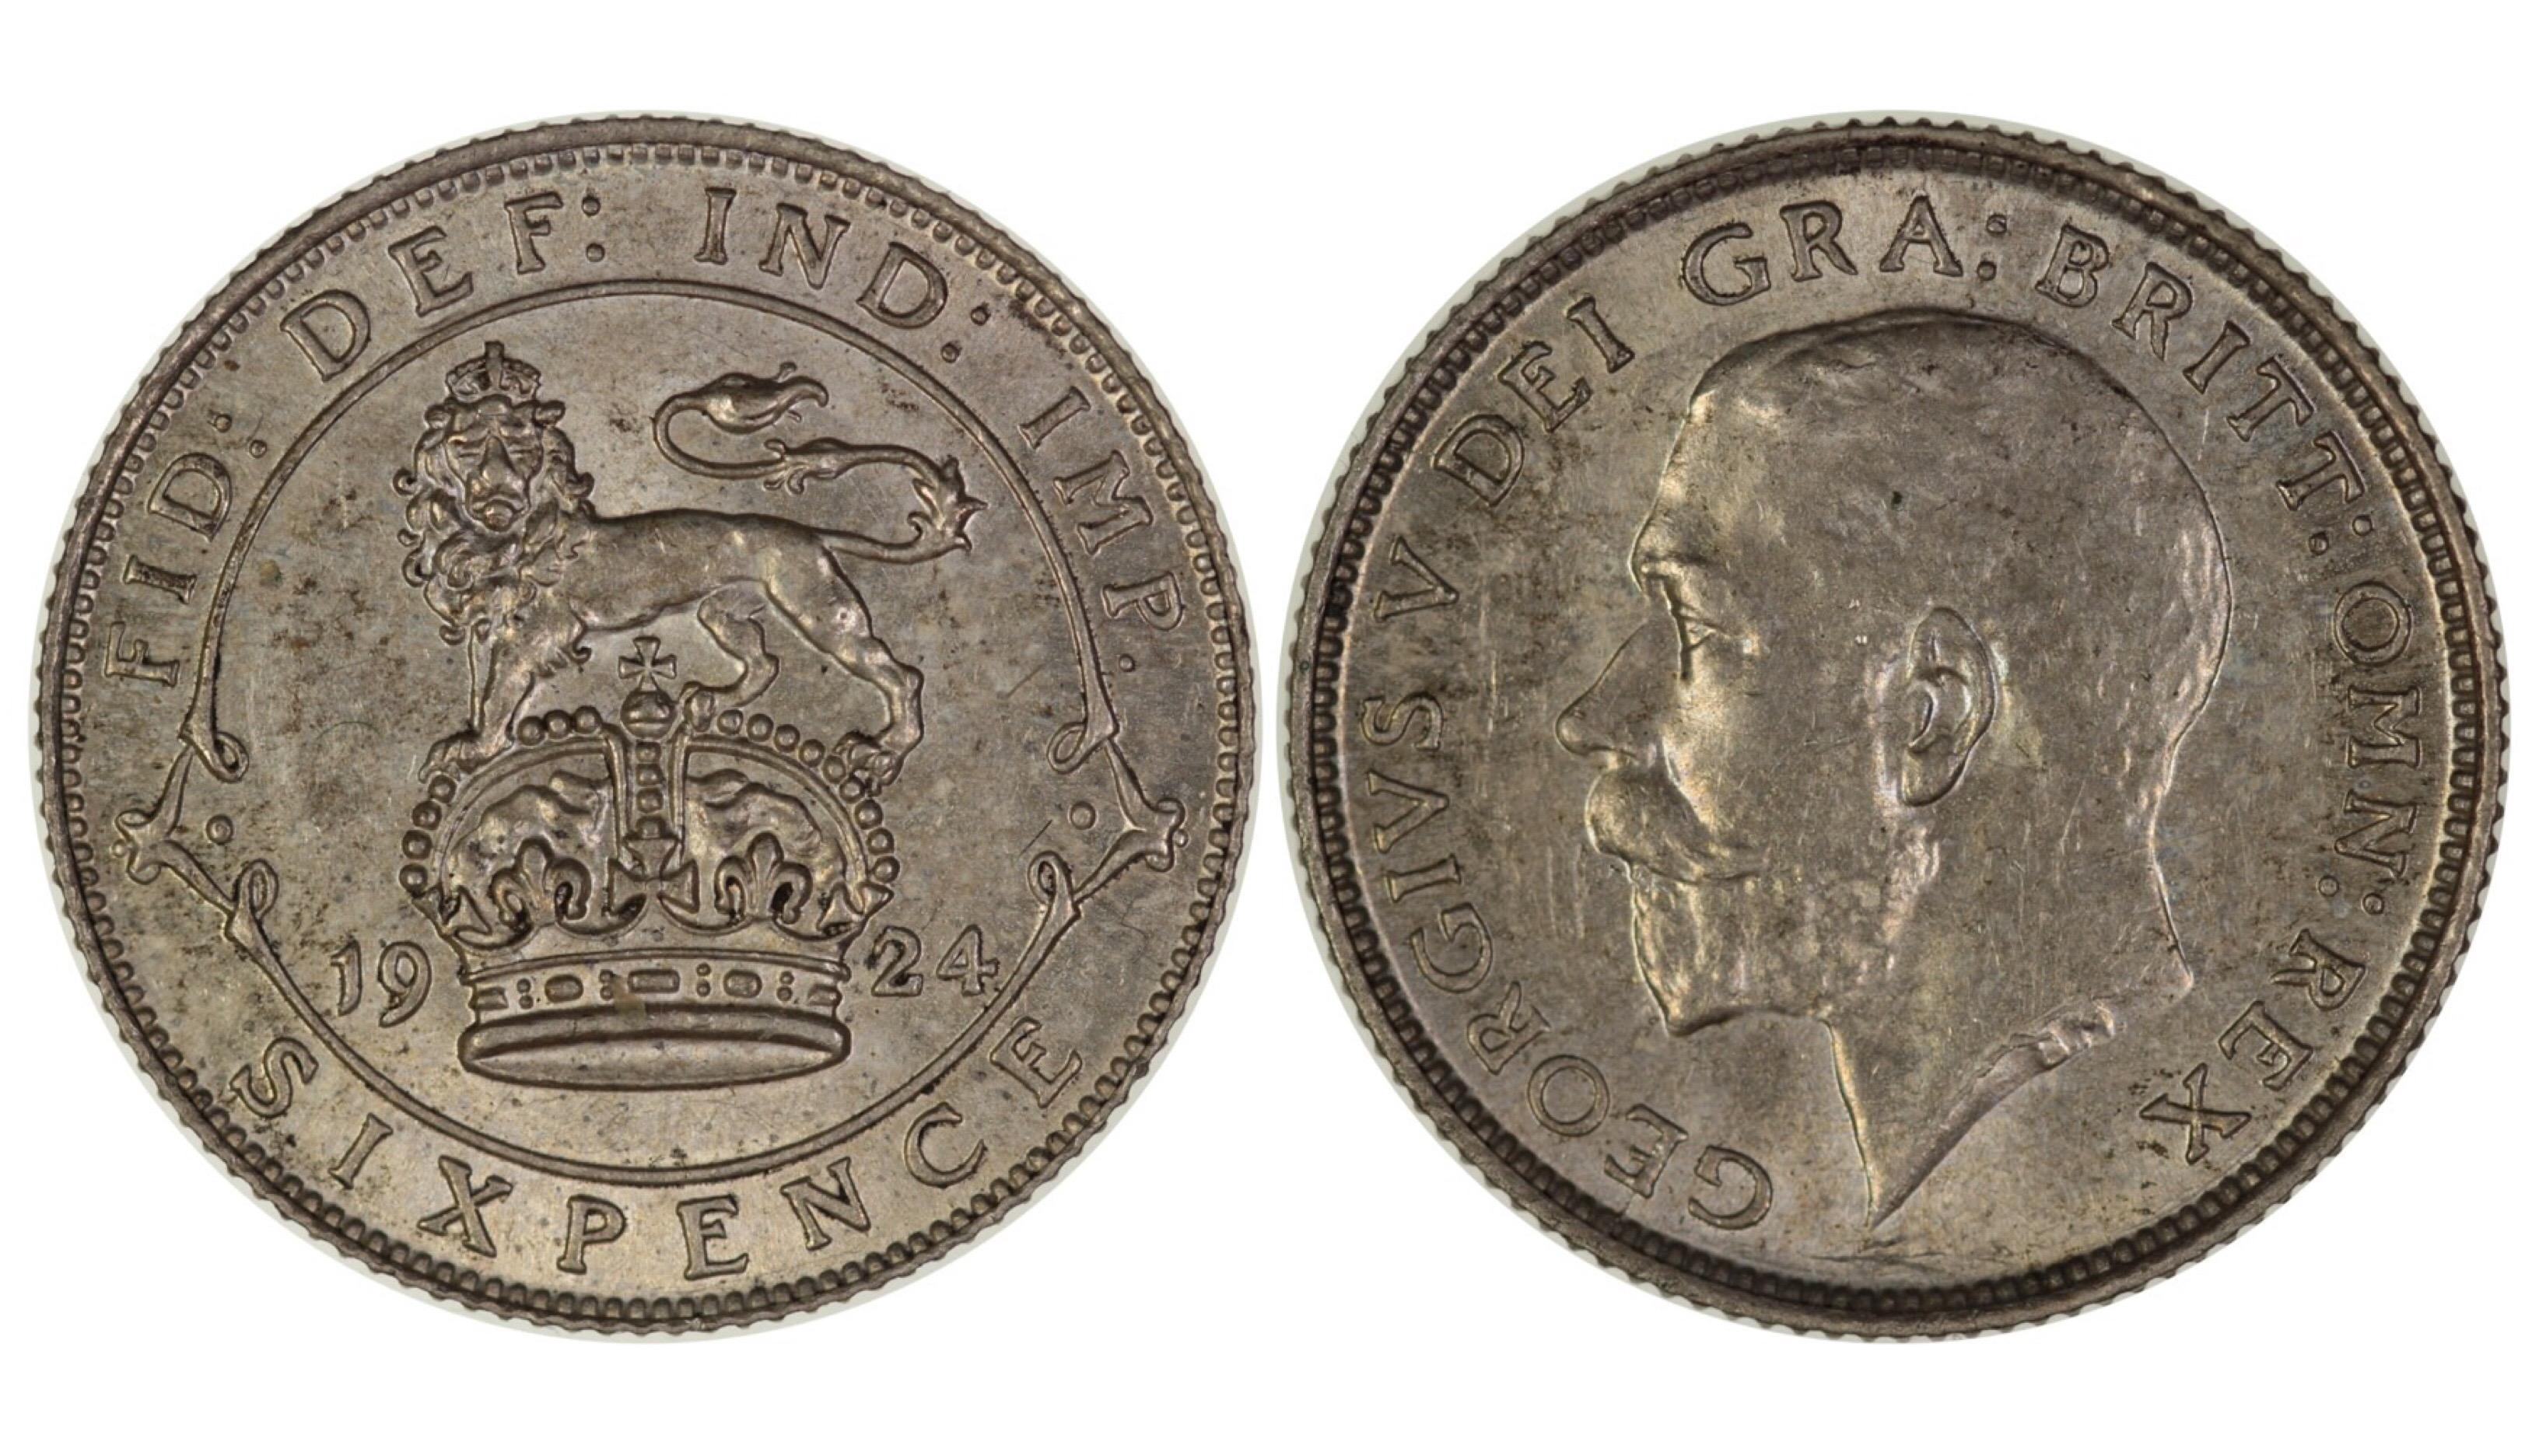 1924 sixpence, aUNC, George V, ESC 1810, Davies 1878